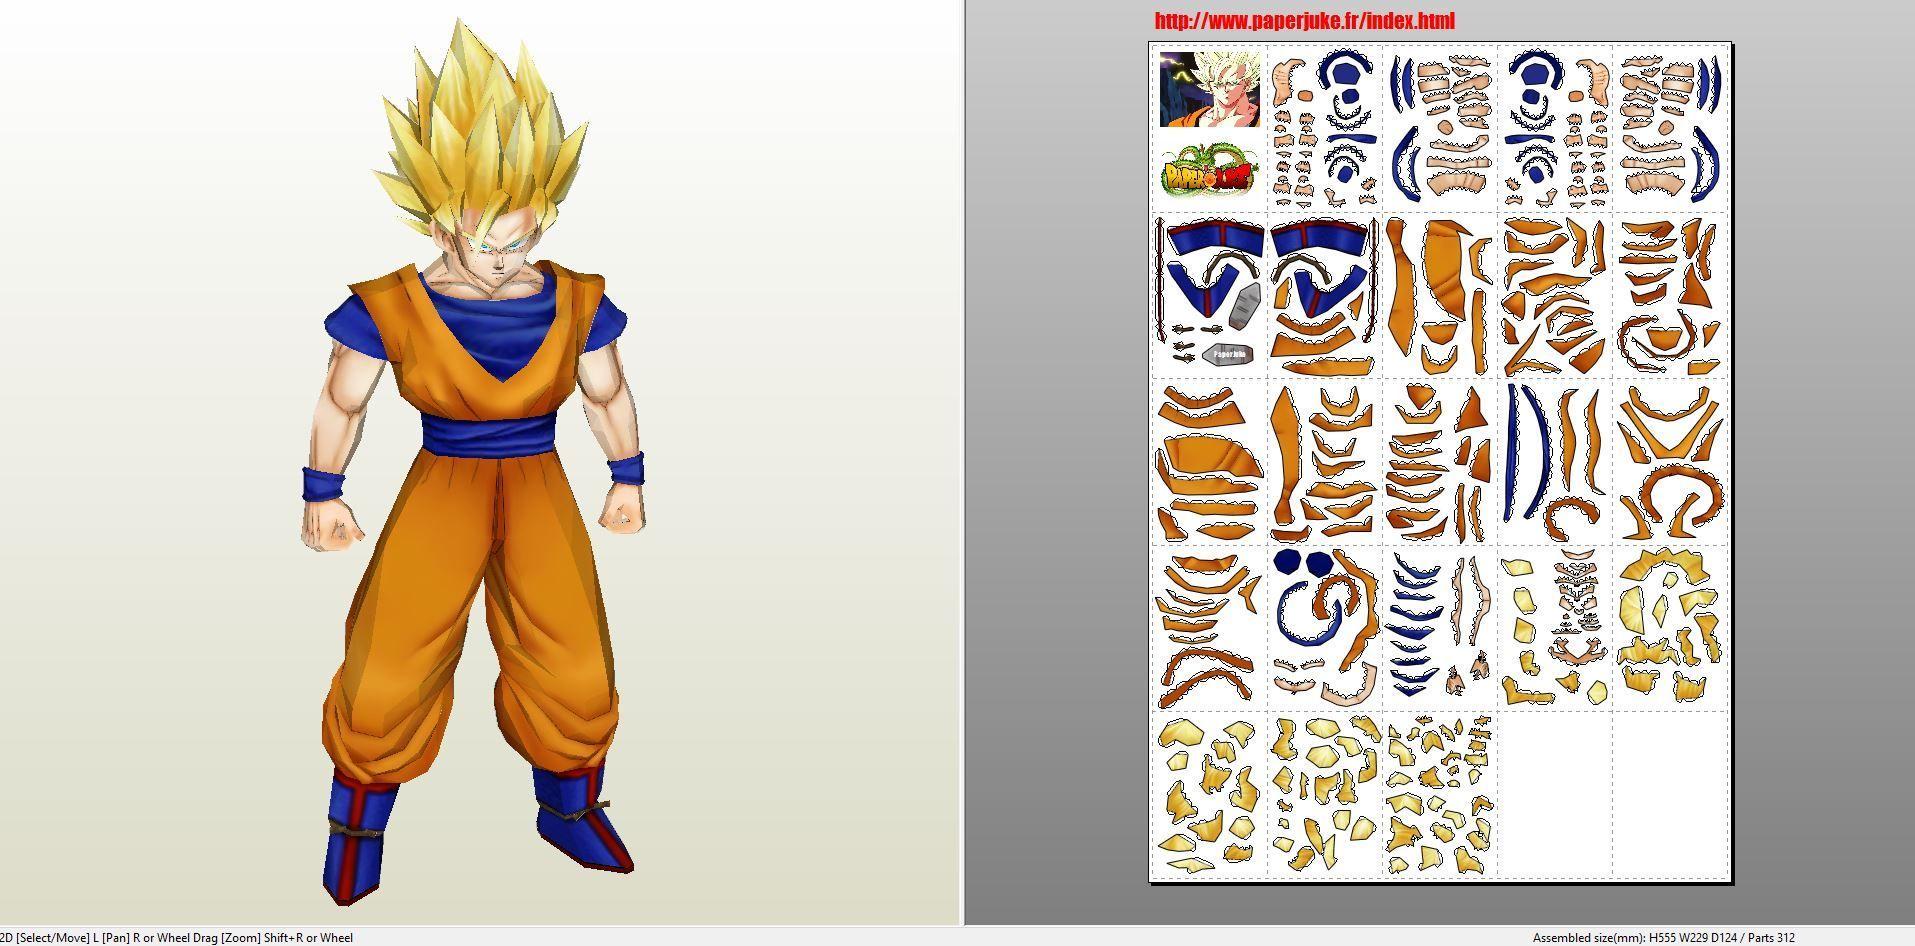 Papercraft .pdo file template for Dragonball Z - Son Goku ... - photo#40